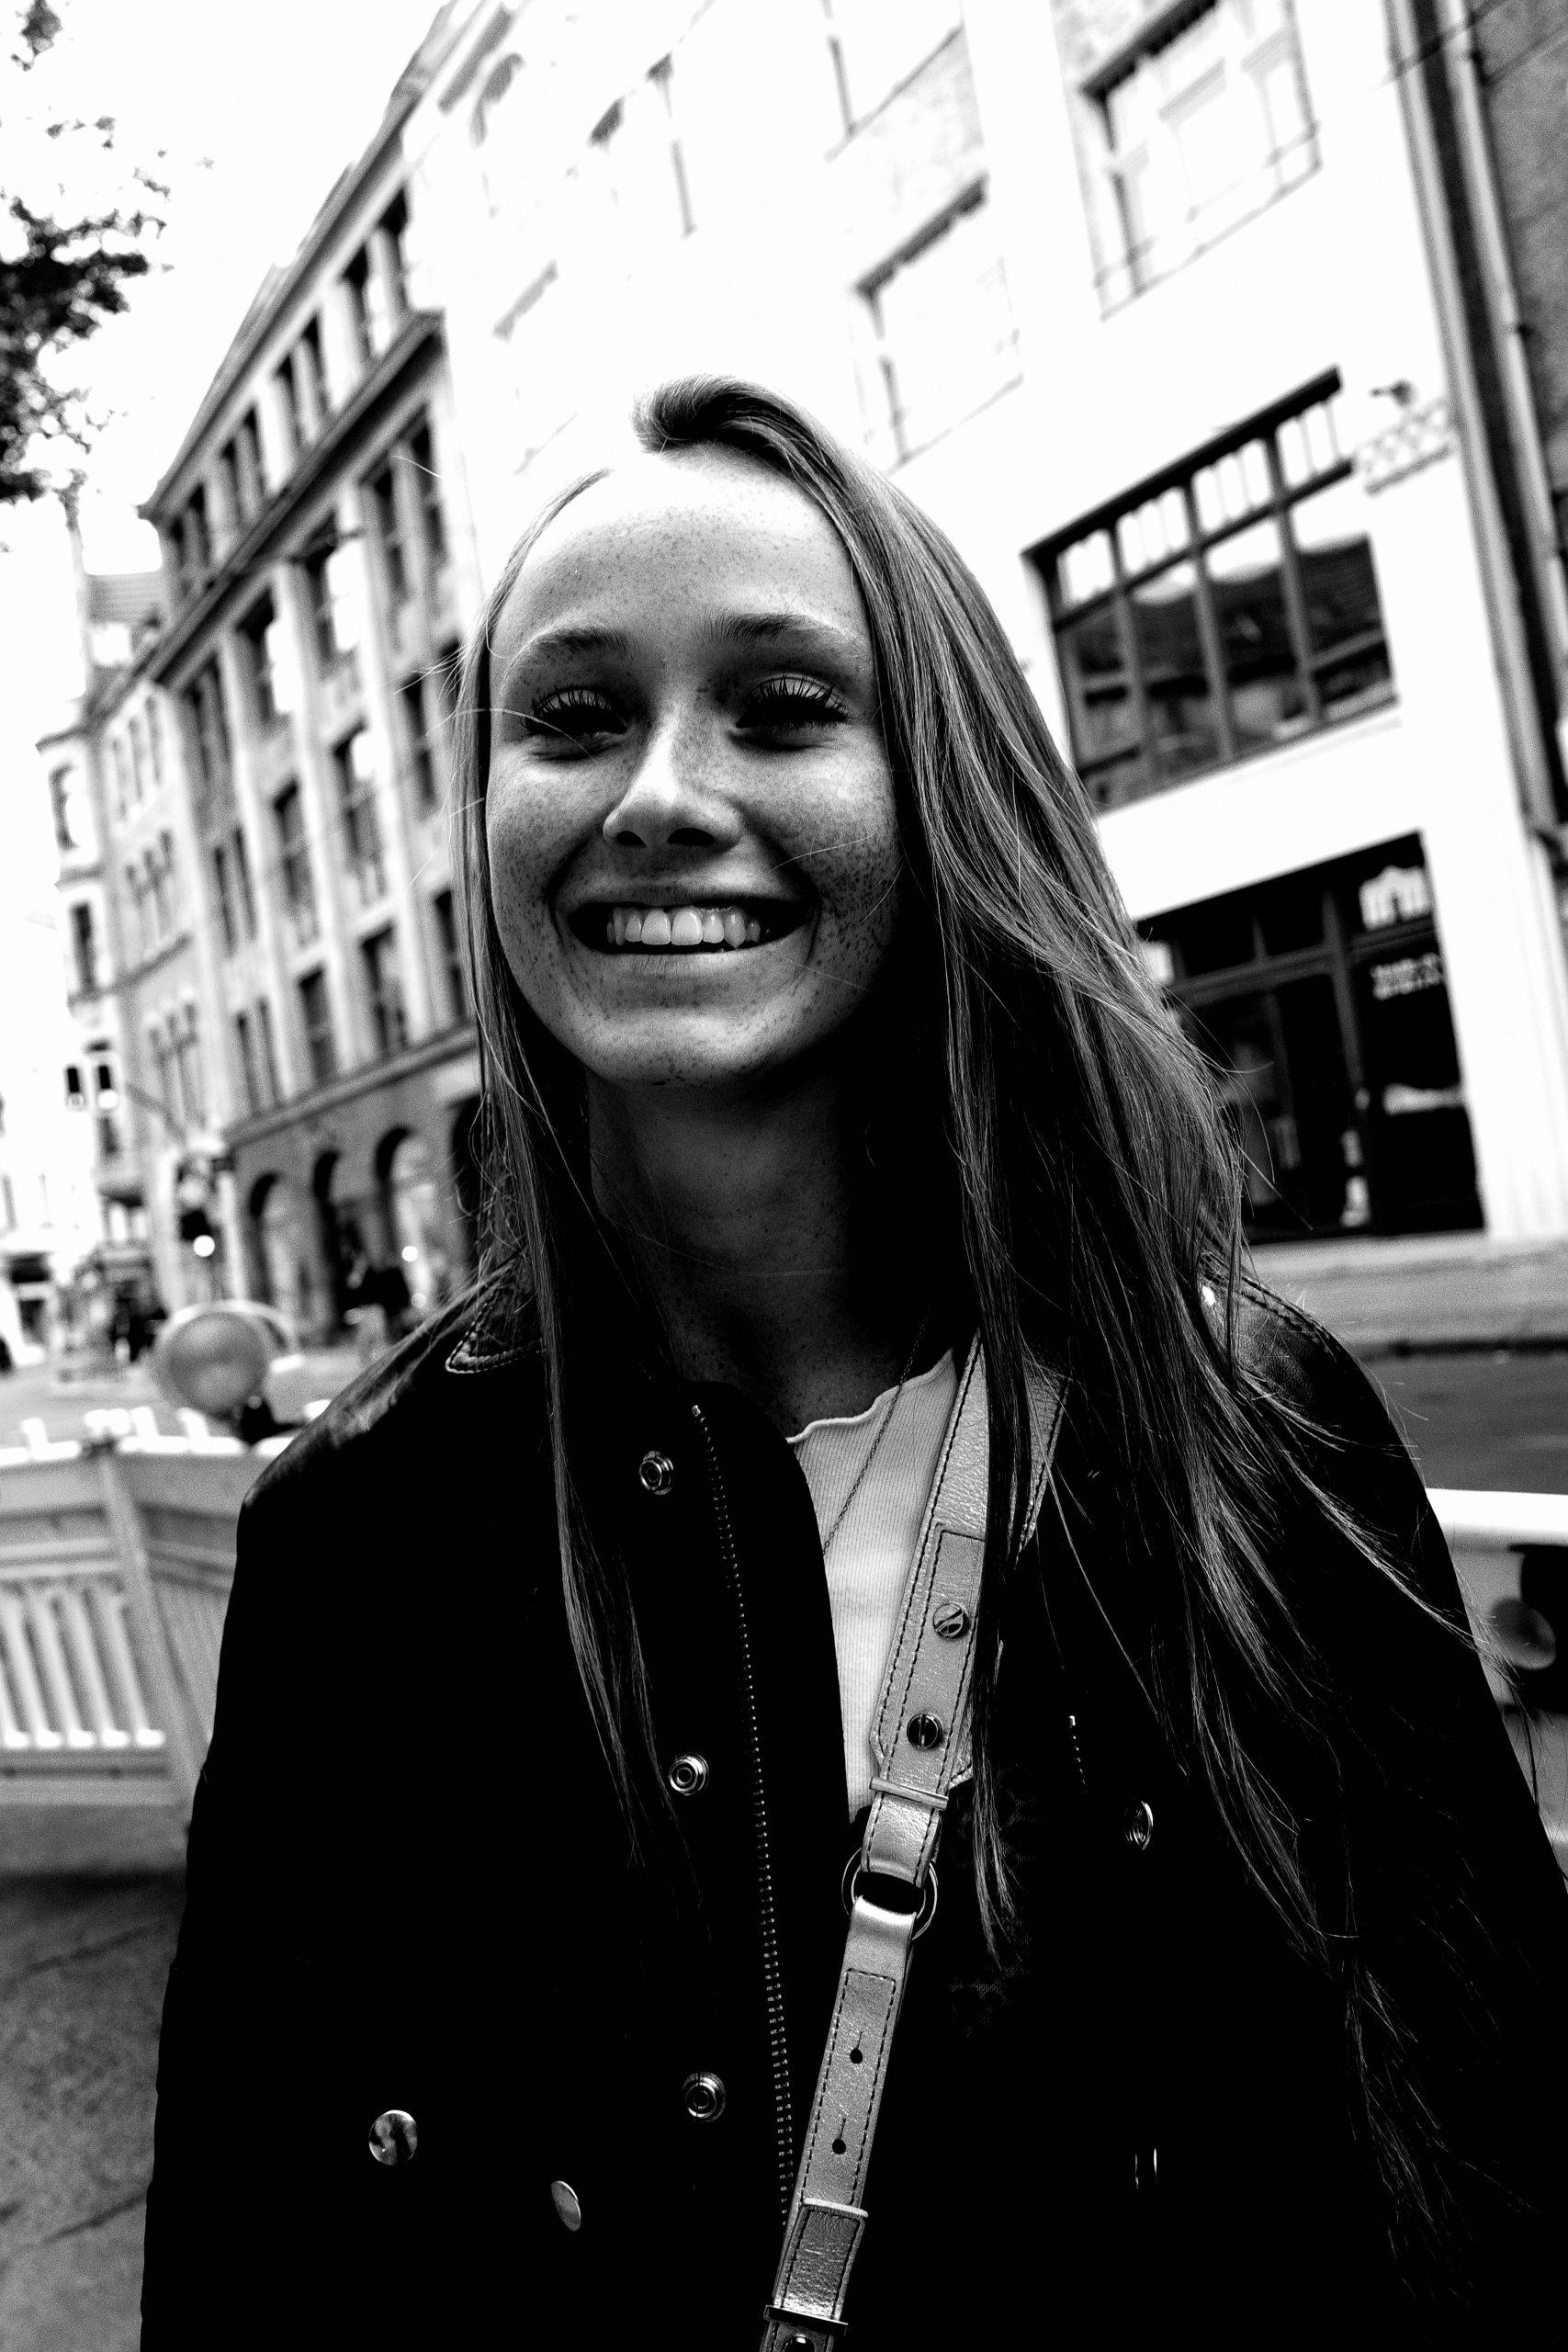 street portrait Berlin ERIC KIM black and white